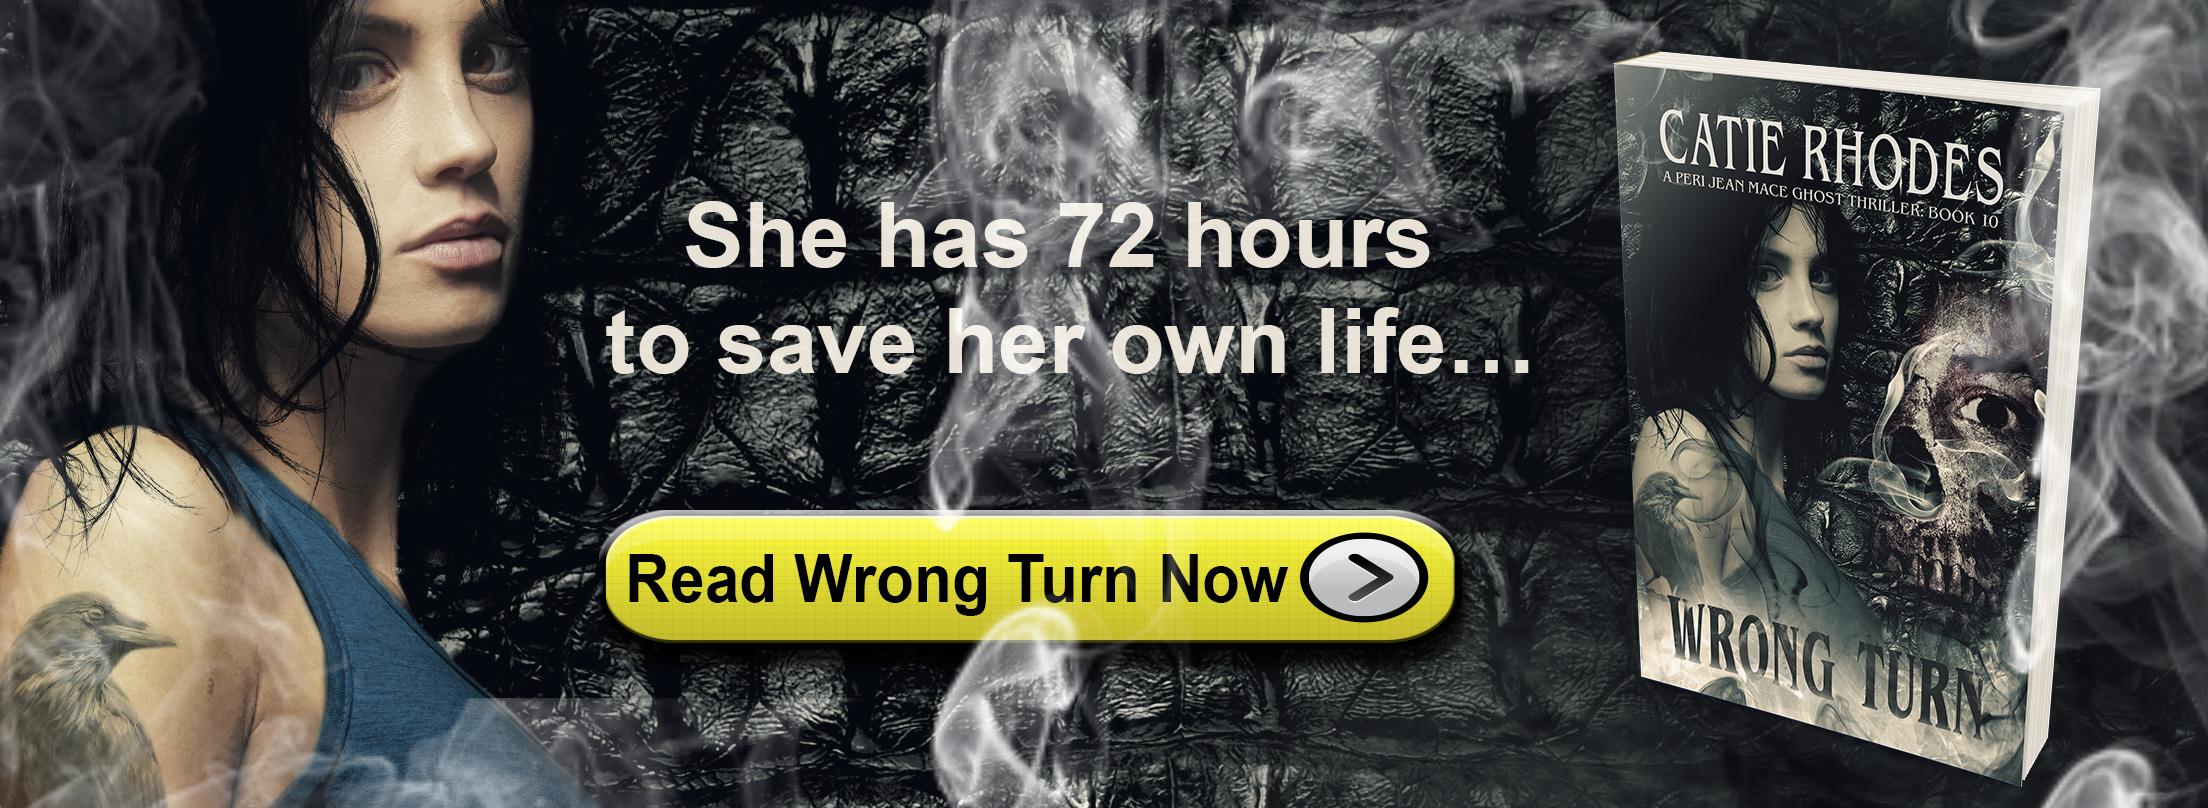 WebsiteBannerWrongTurn